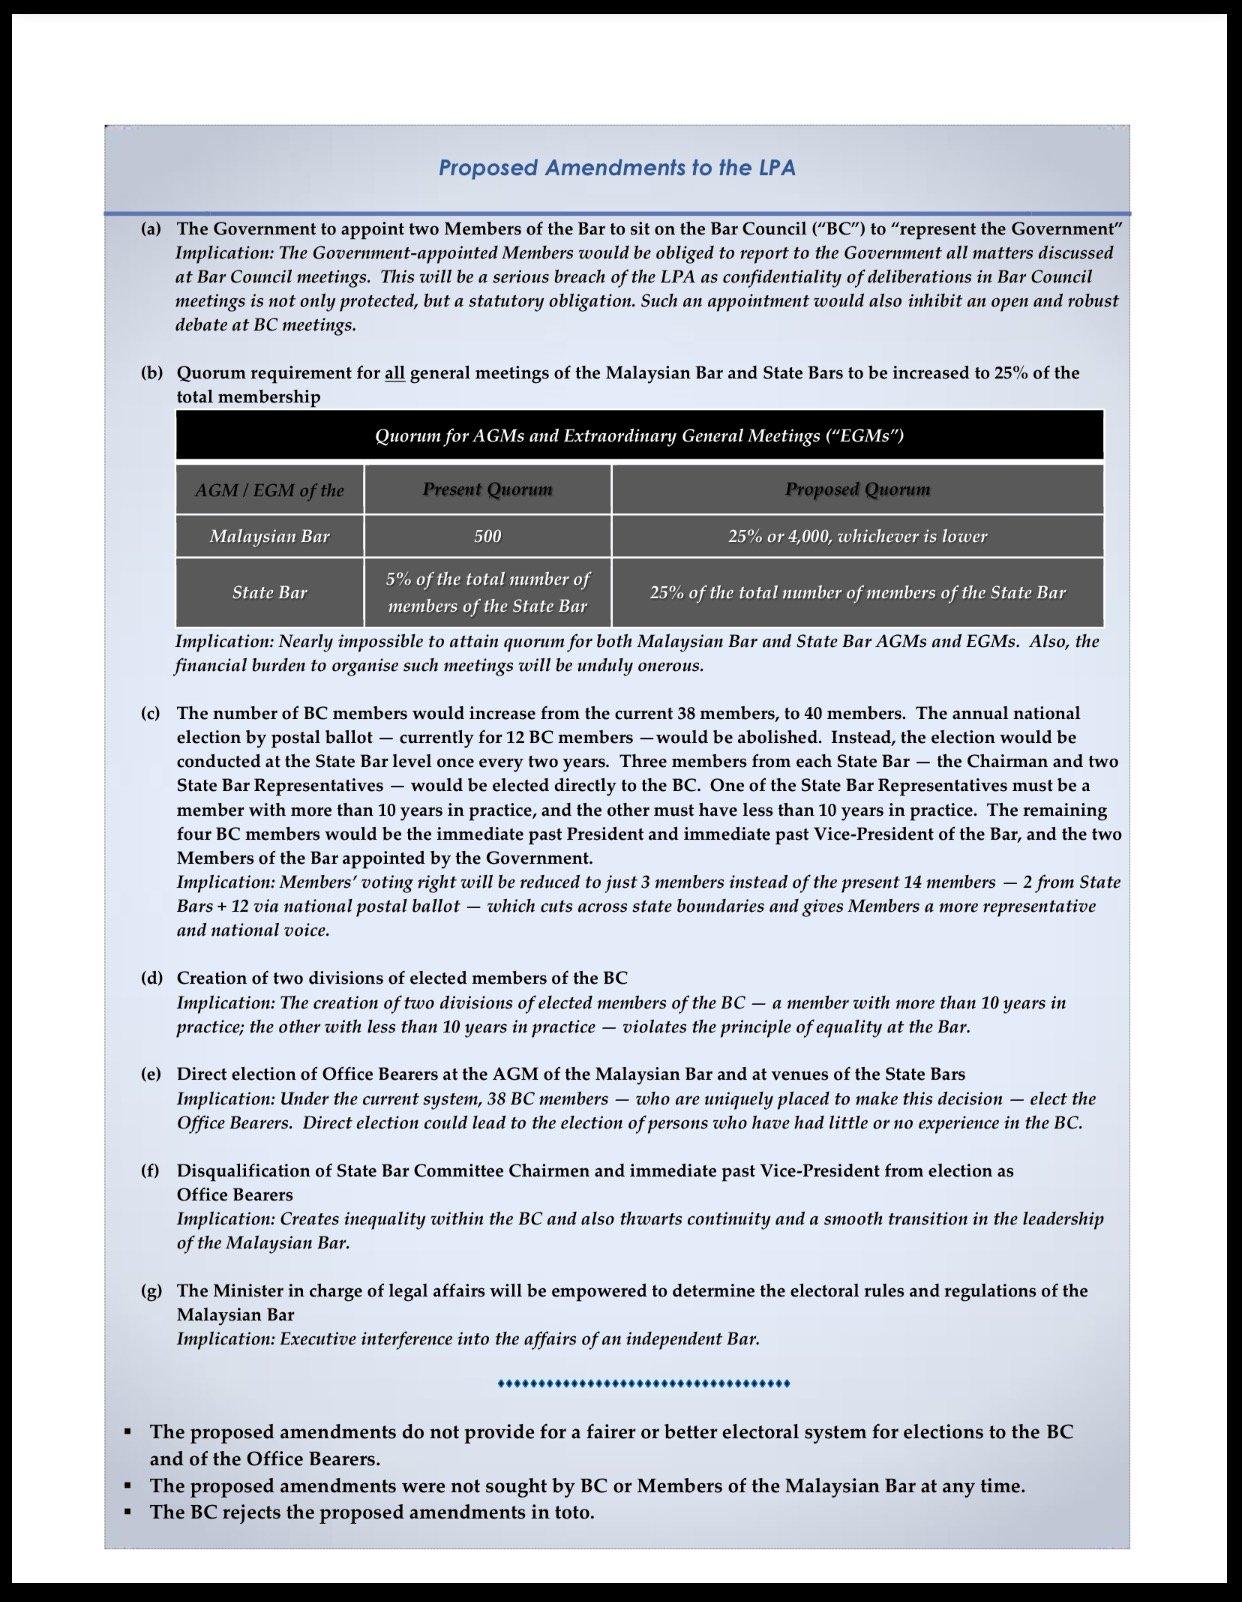 LPA Amendments image 02